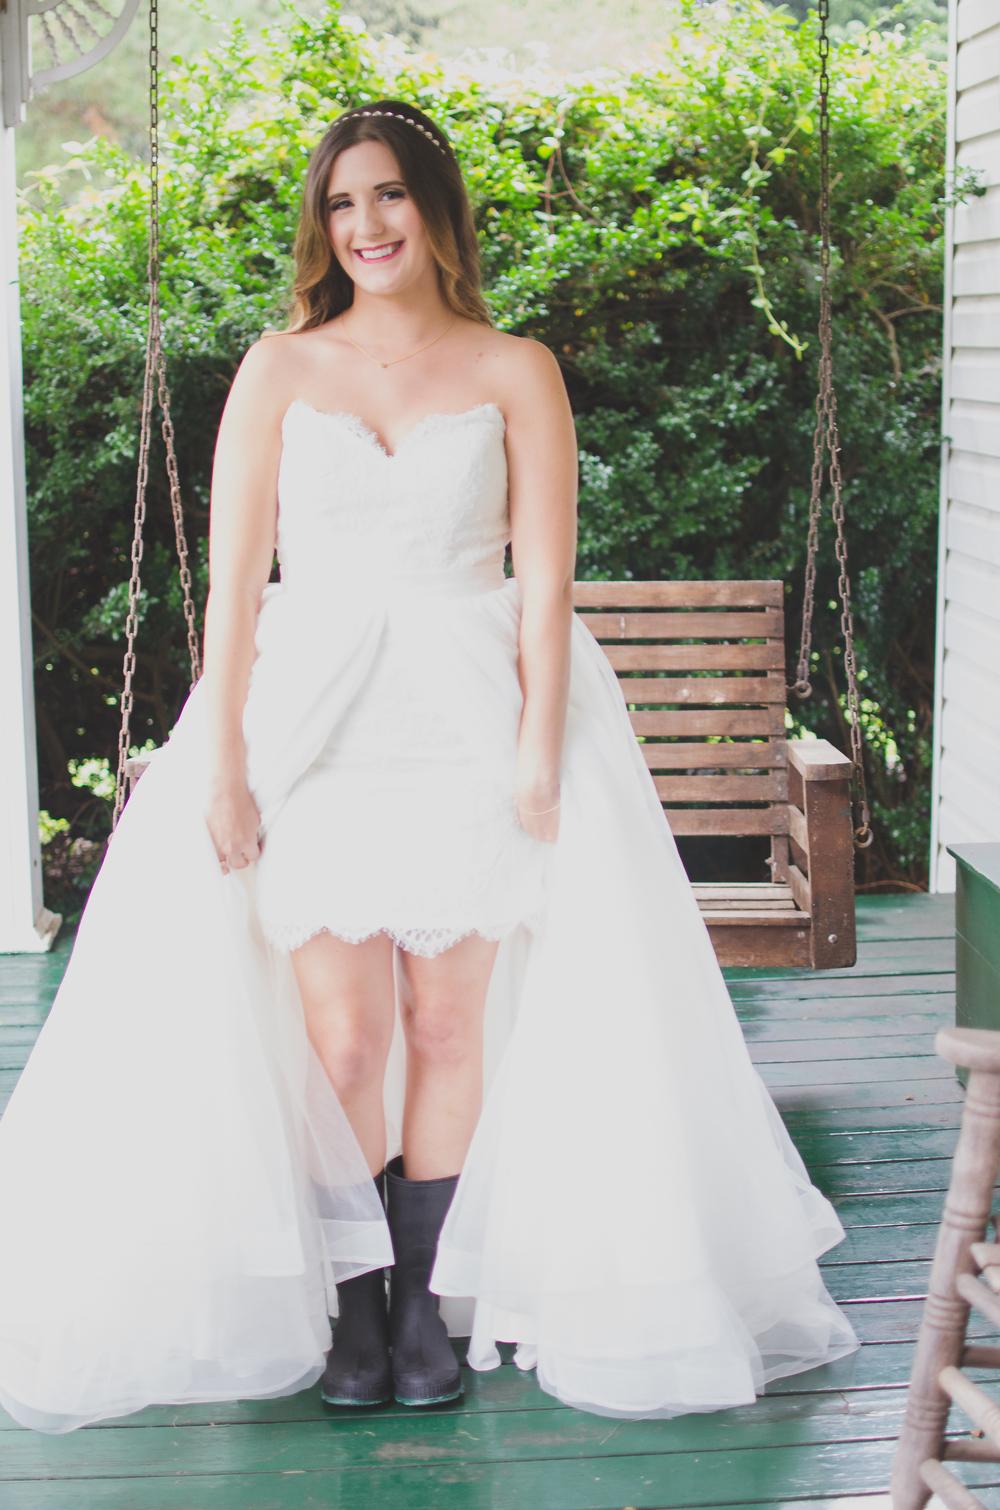 The Glasgow Farm Wedding bride Photo